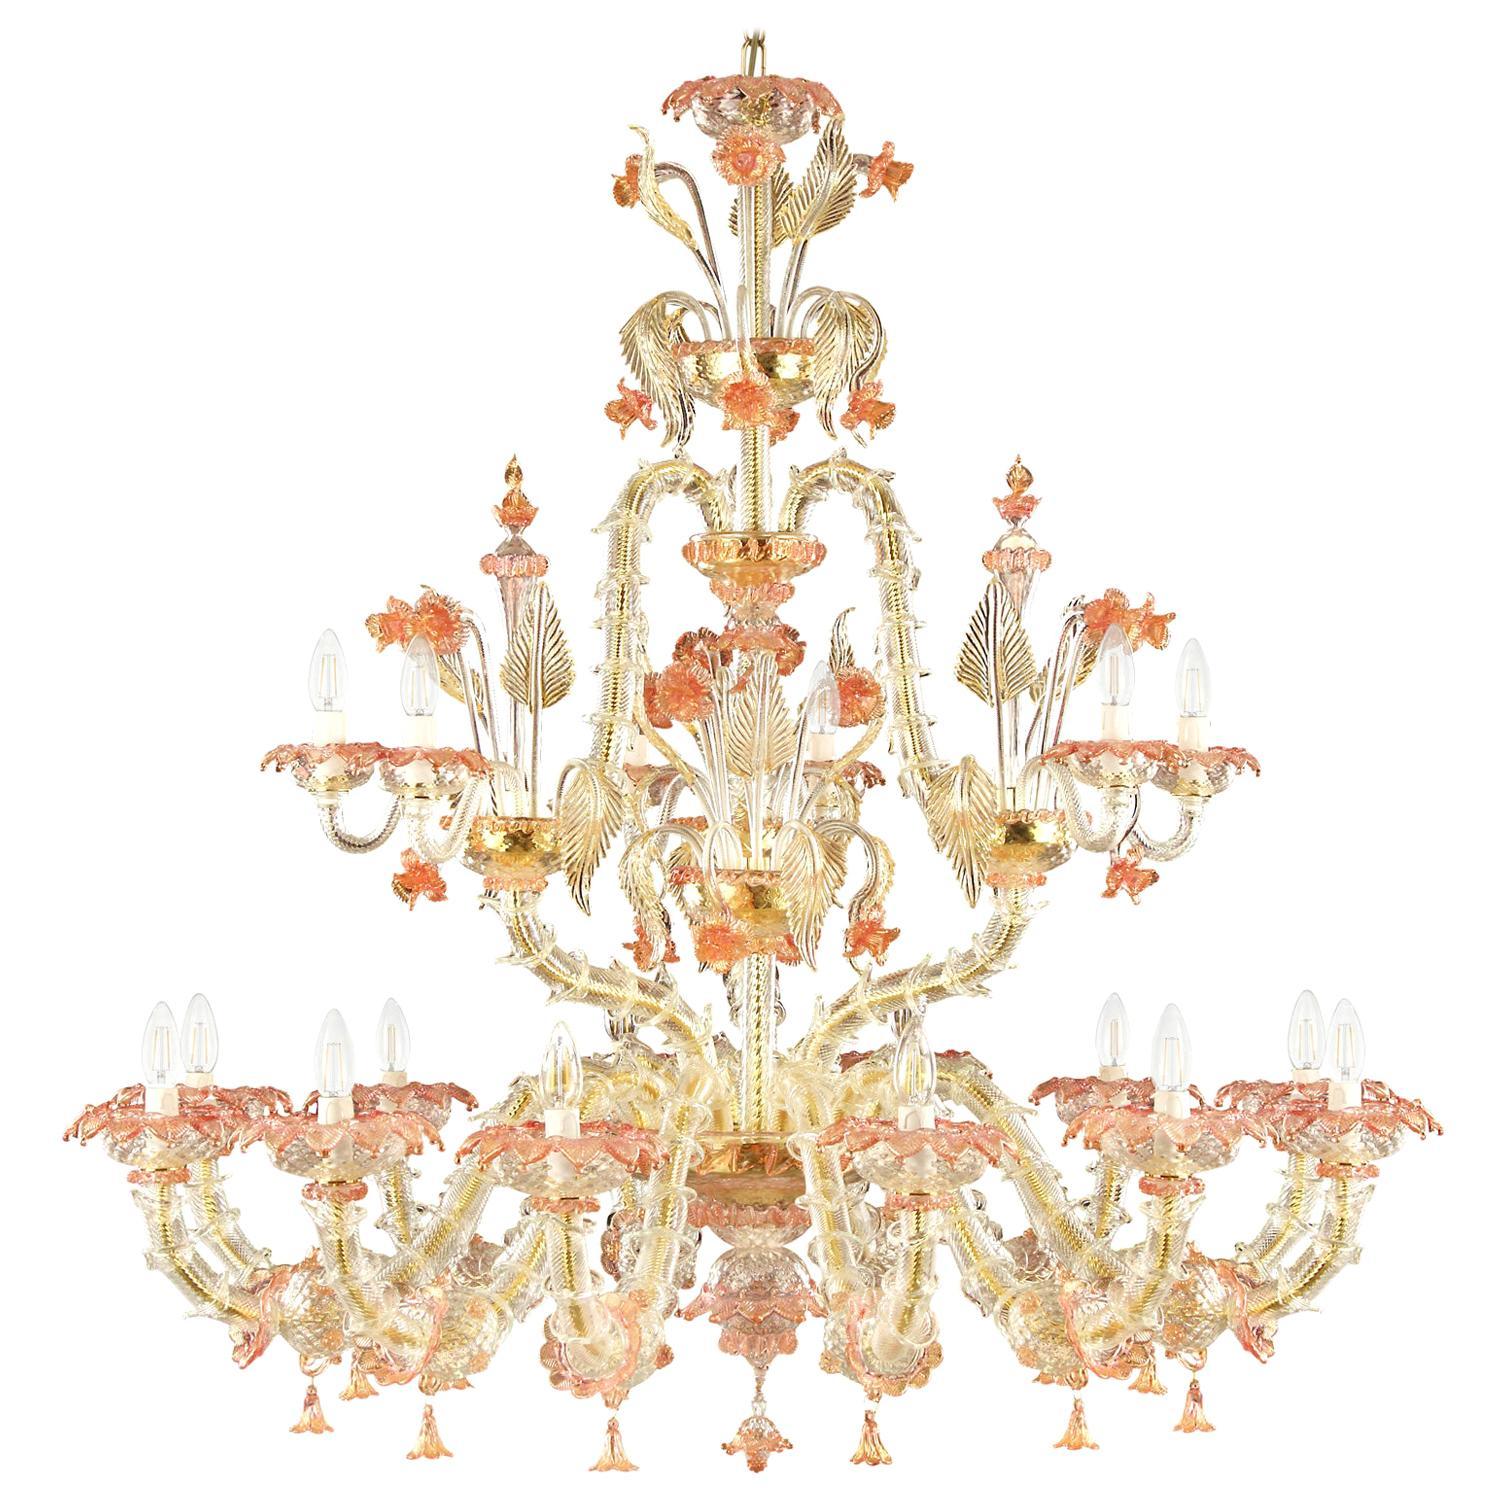 Luxury Rezzonico Chandelier 12+6 Arms Clear Multi-Color Murano Glass, Multiforme